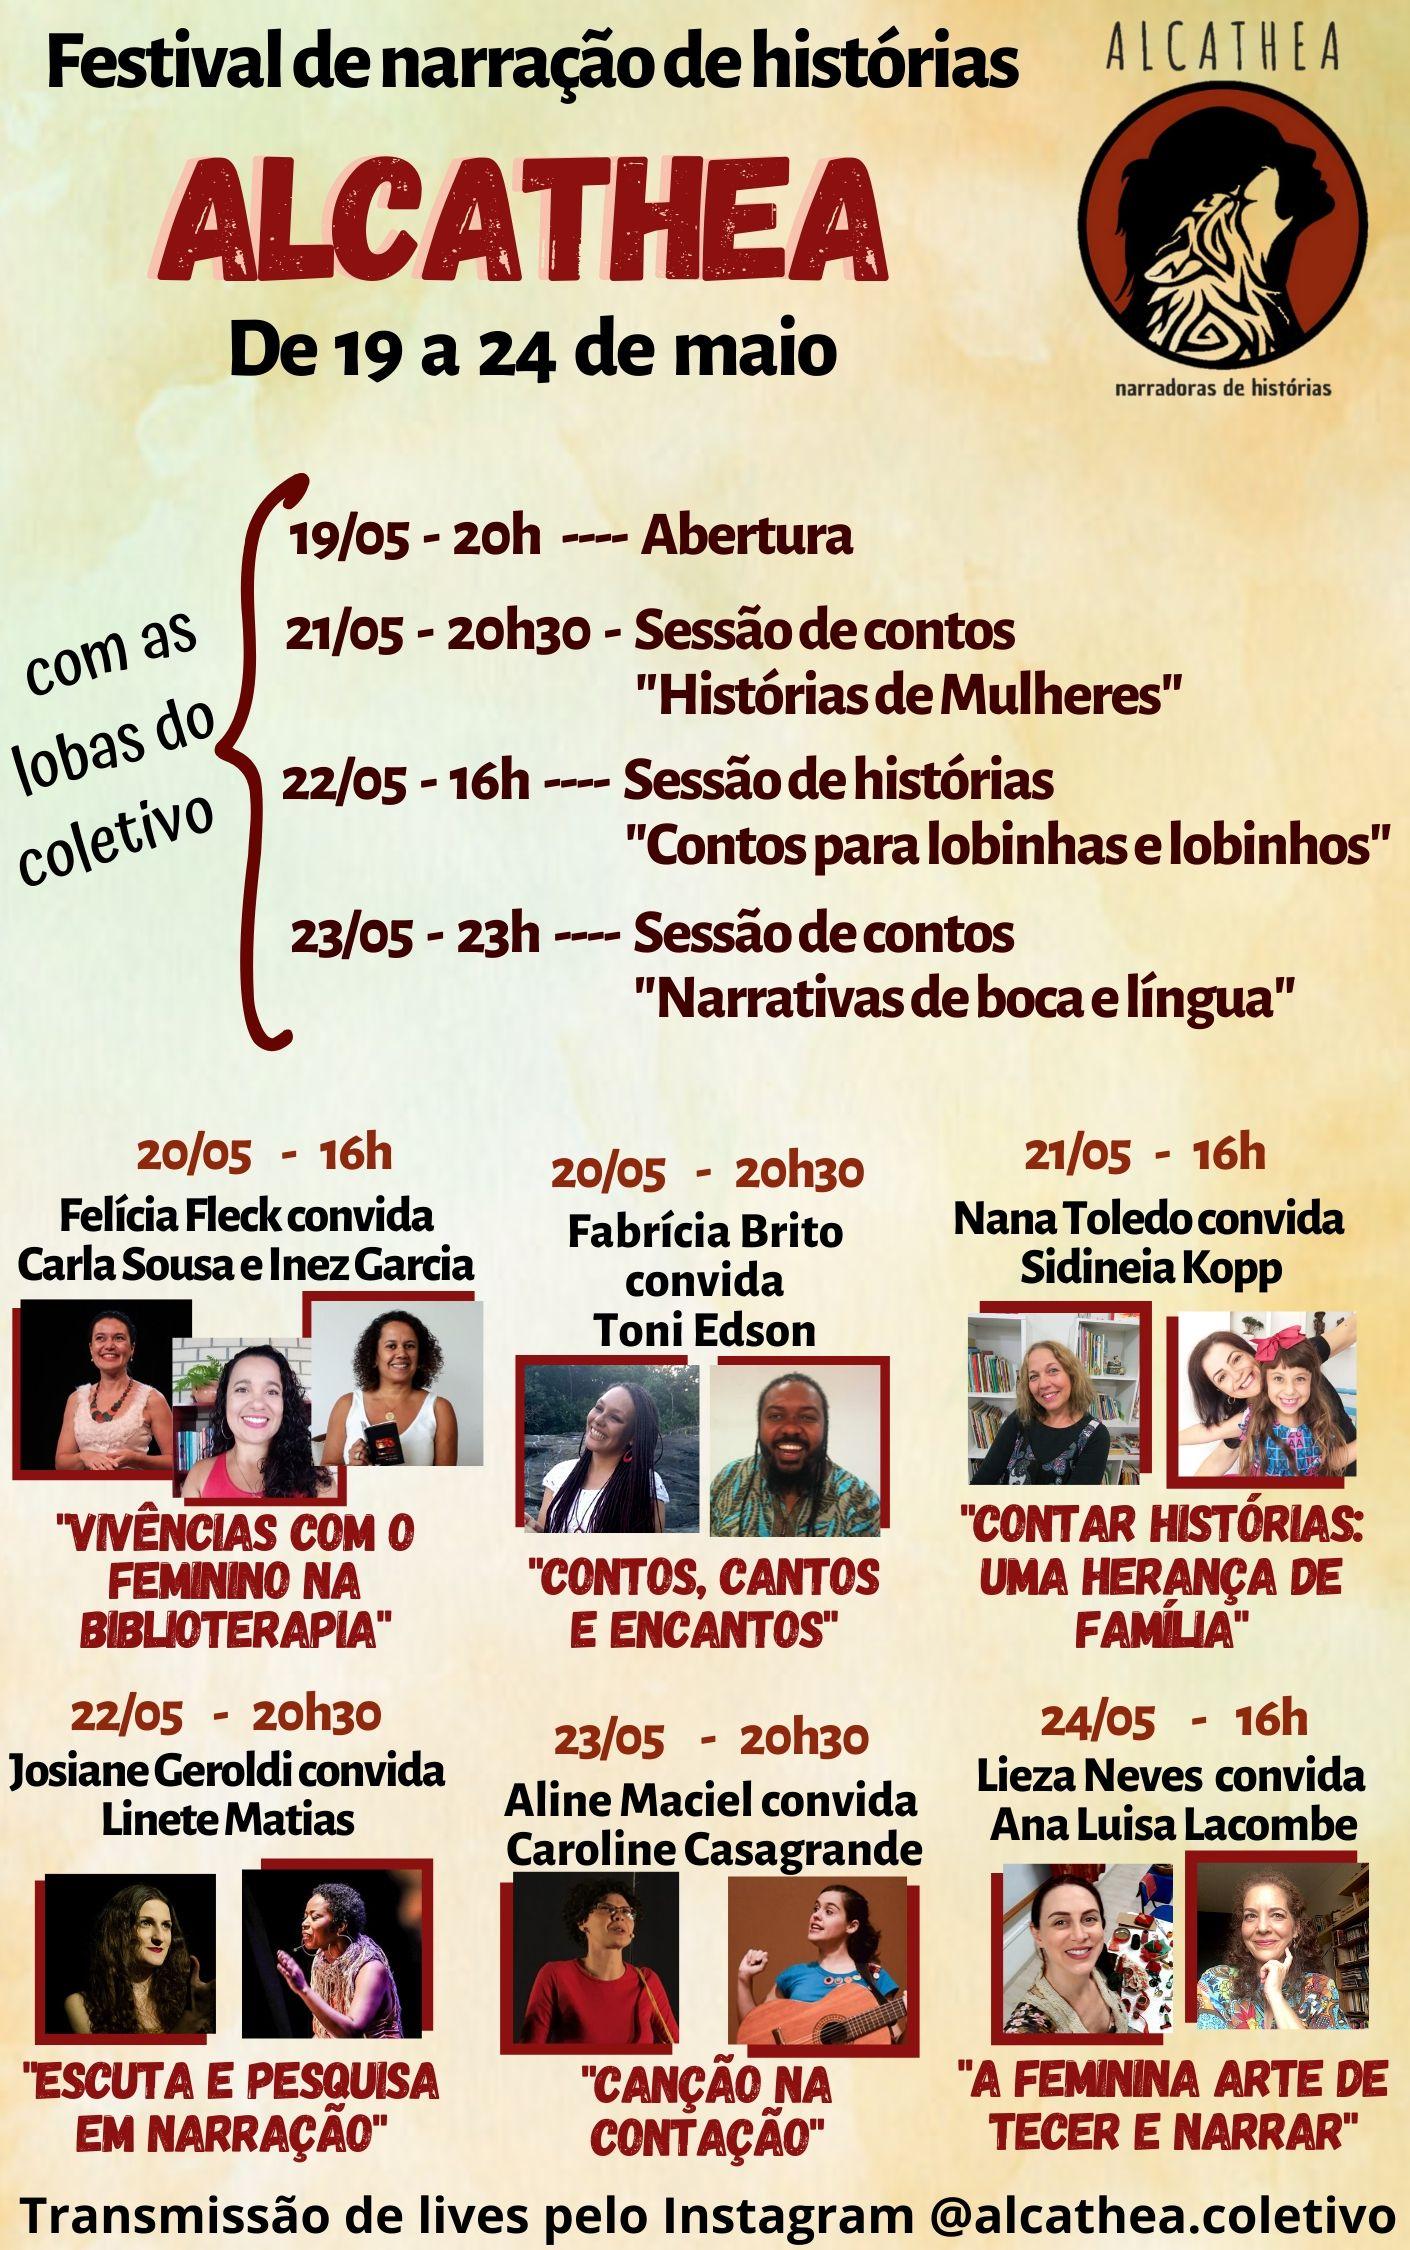 20 05 festival alcathea (1)